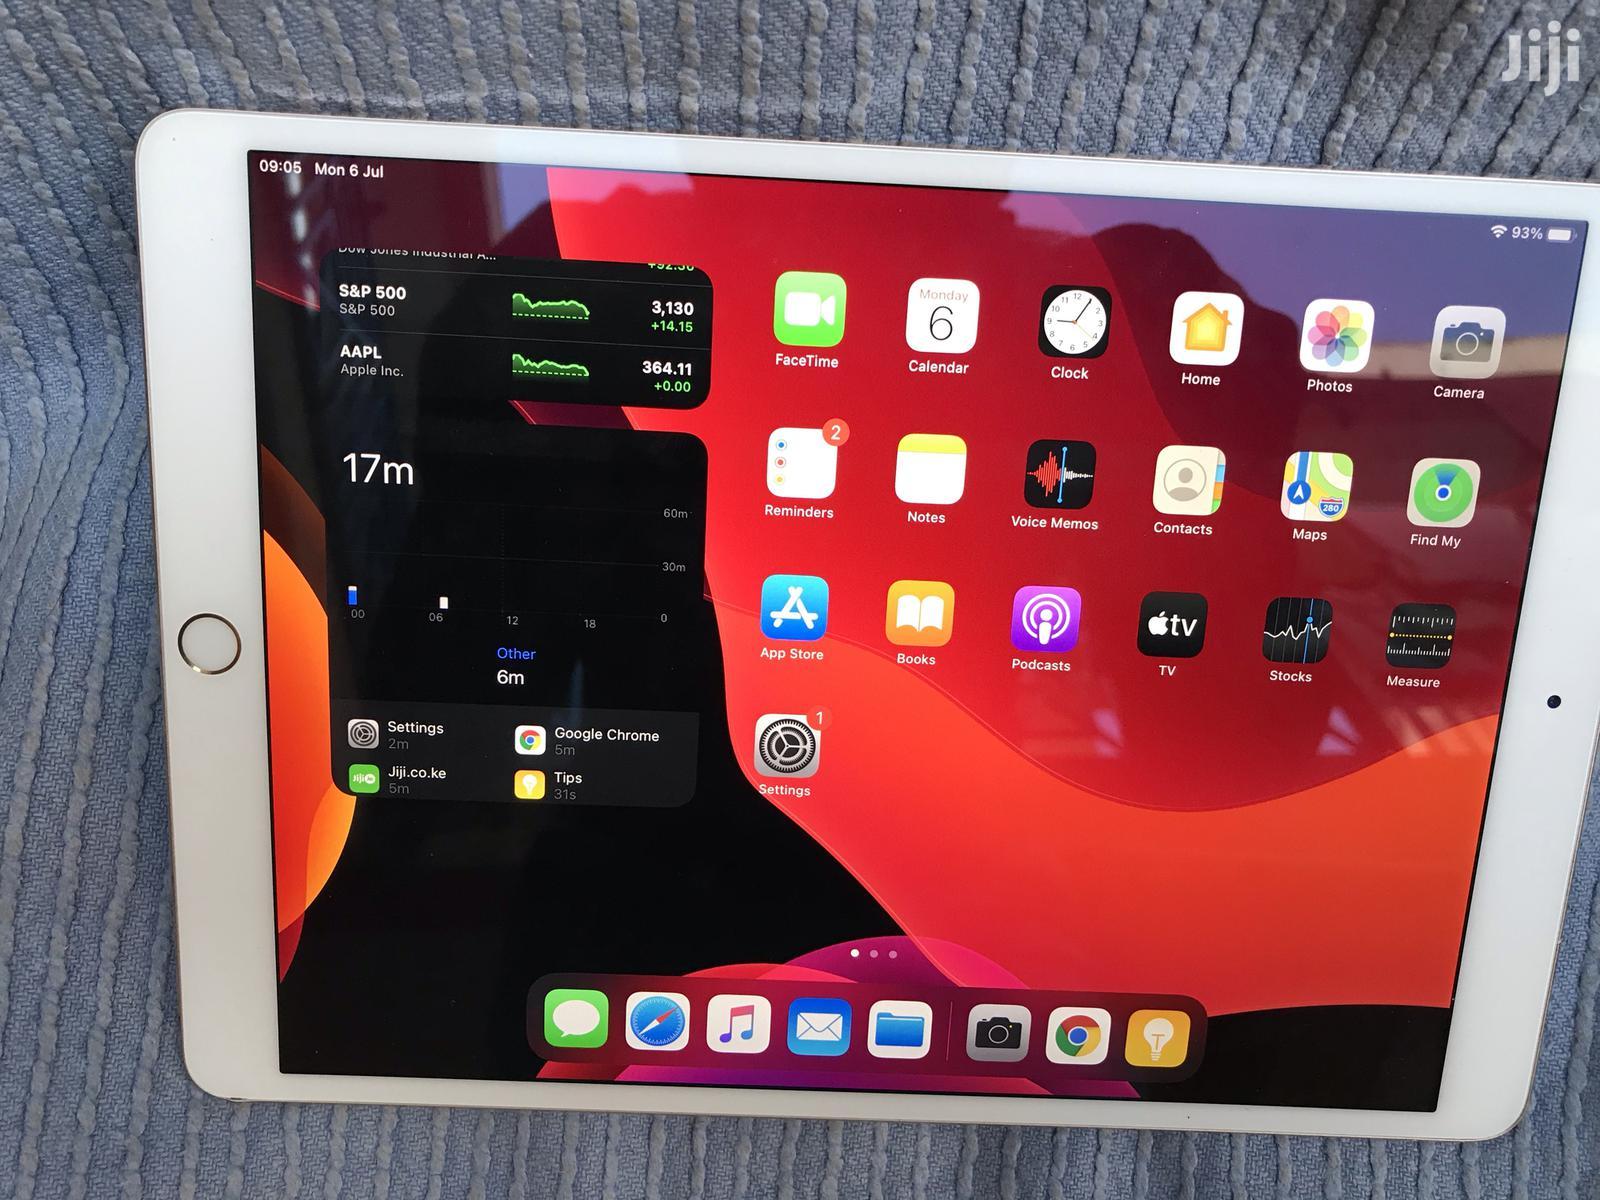 Apple iPad Pro 10.5 256 GB | Tablets for sale in Kilimani, Nairobi, Kenya